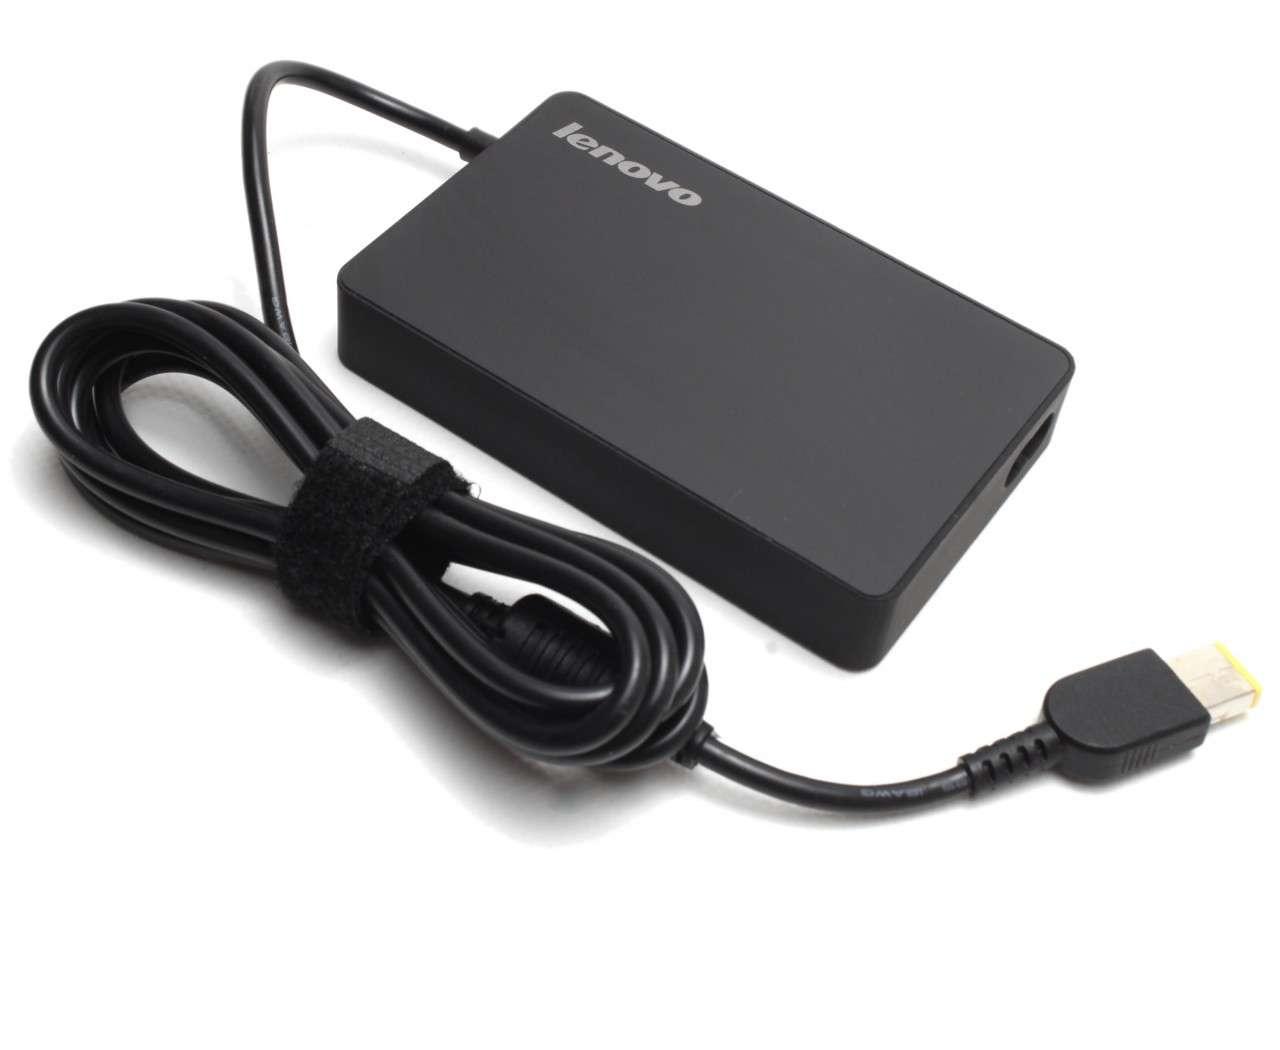 Incarcator Lenovo ThinkPad L540 20AU 65W Slim Version imagine